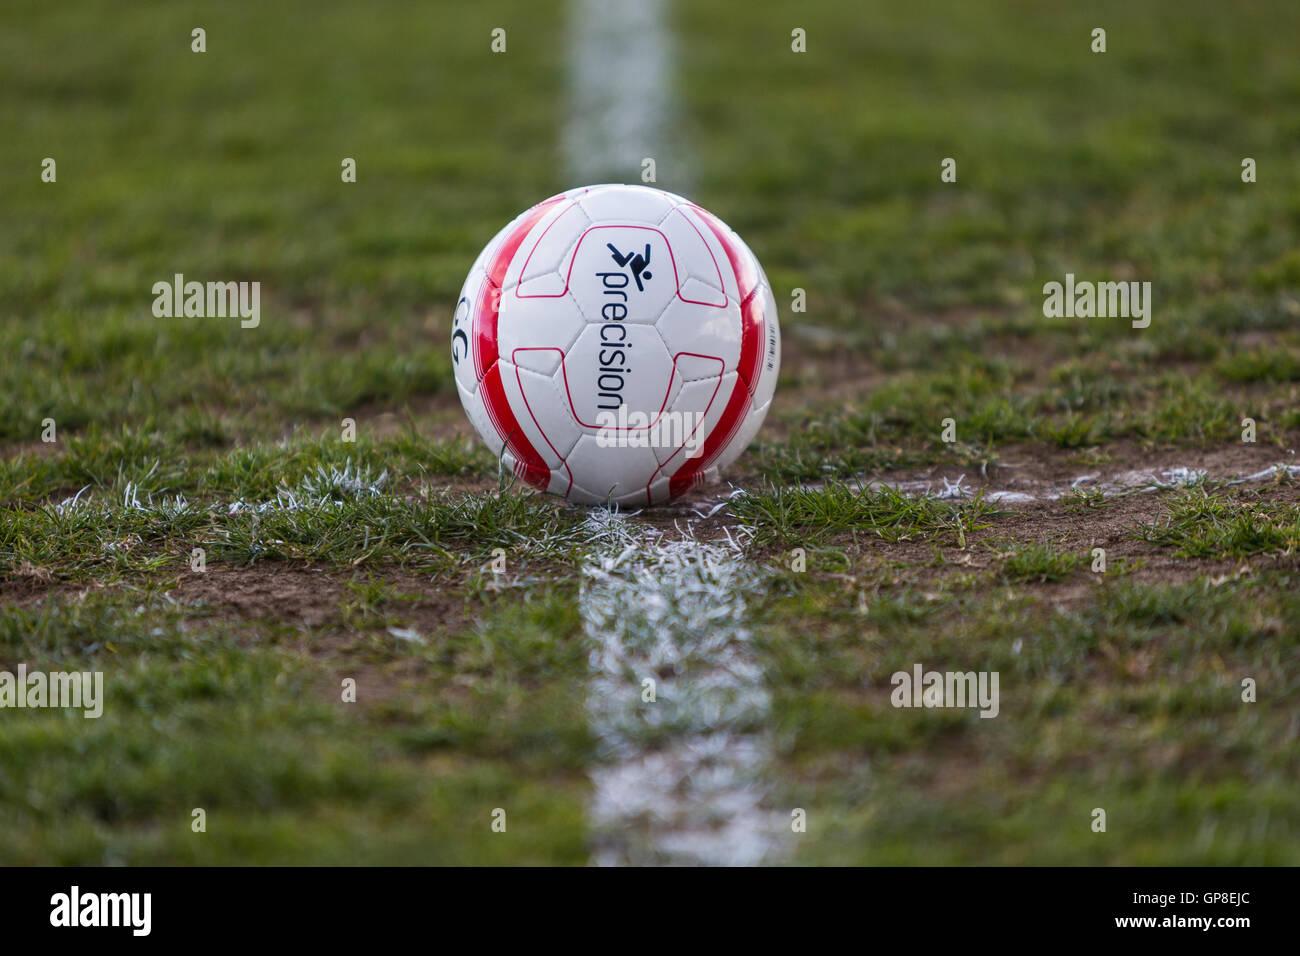 Football on the halfway line awaiting the game kick off - Stock Image